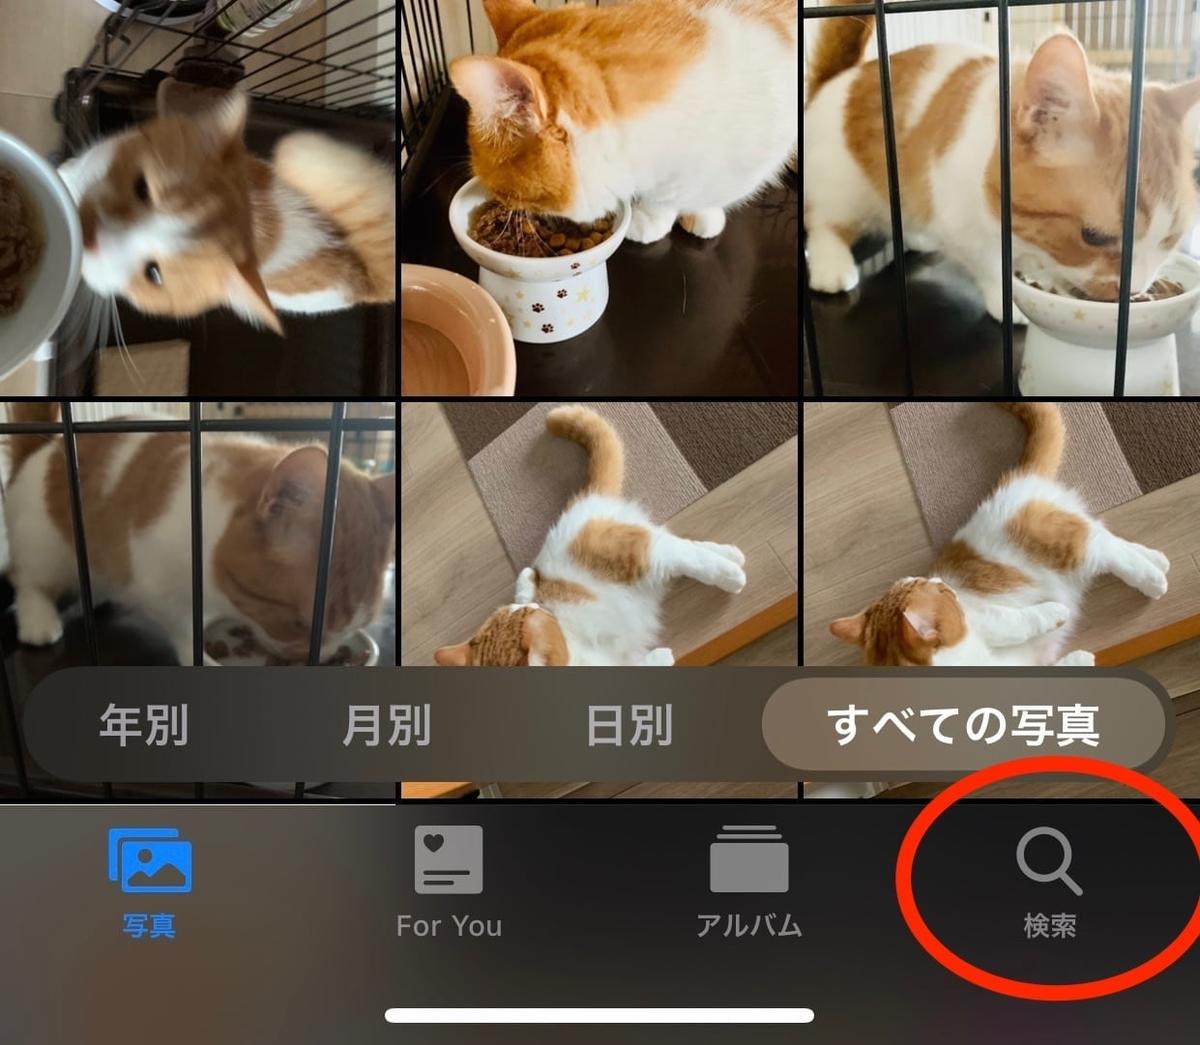 iPhoneのカメラ機能